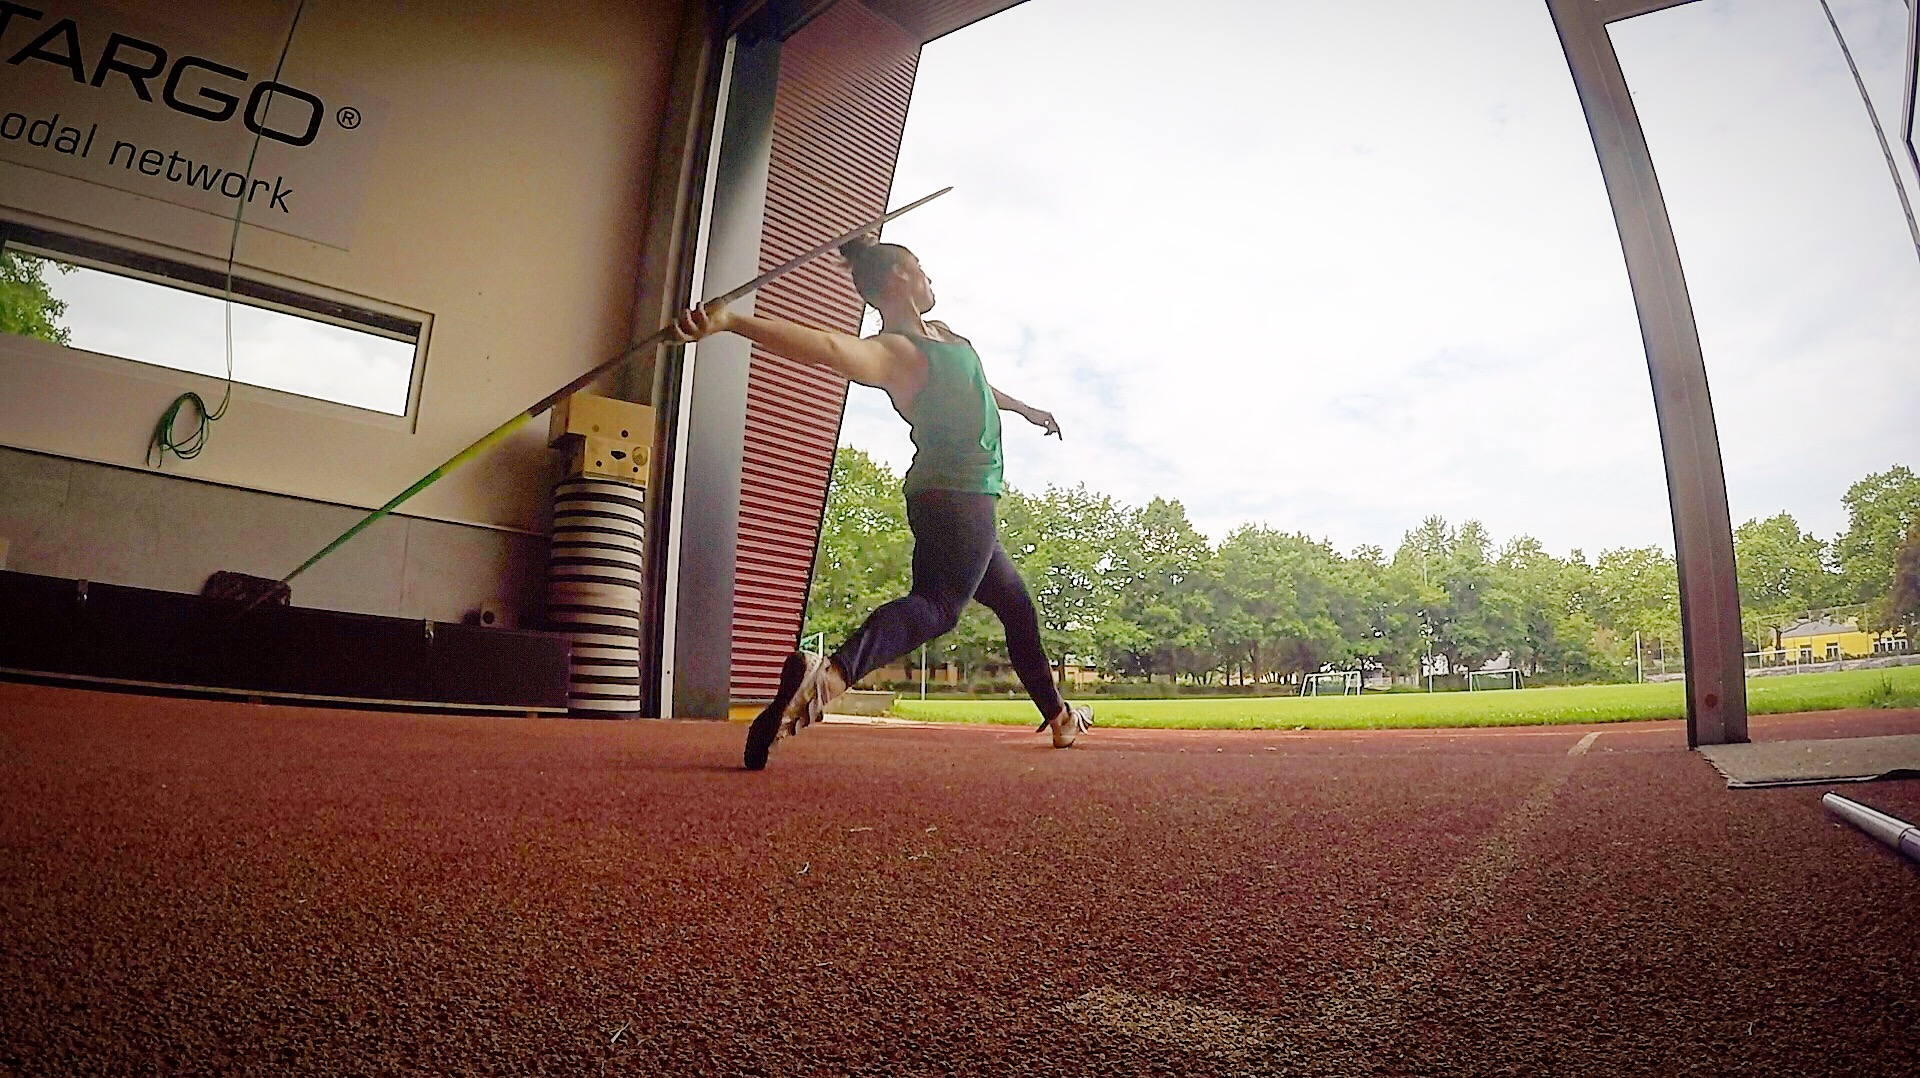 Last throwing session before this weekend's season opener!